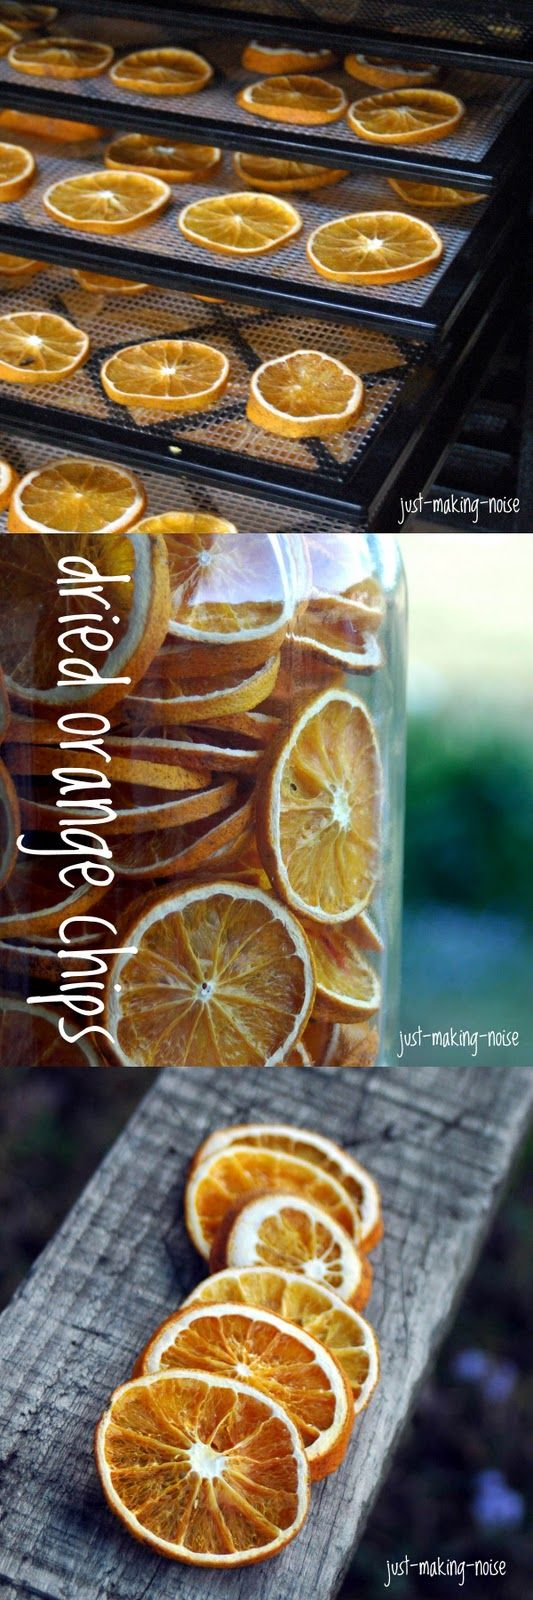 just-making-noise: Crispy Orange Chips (a.k.a - Dehydrated Orange Slices)